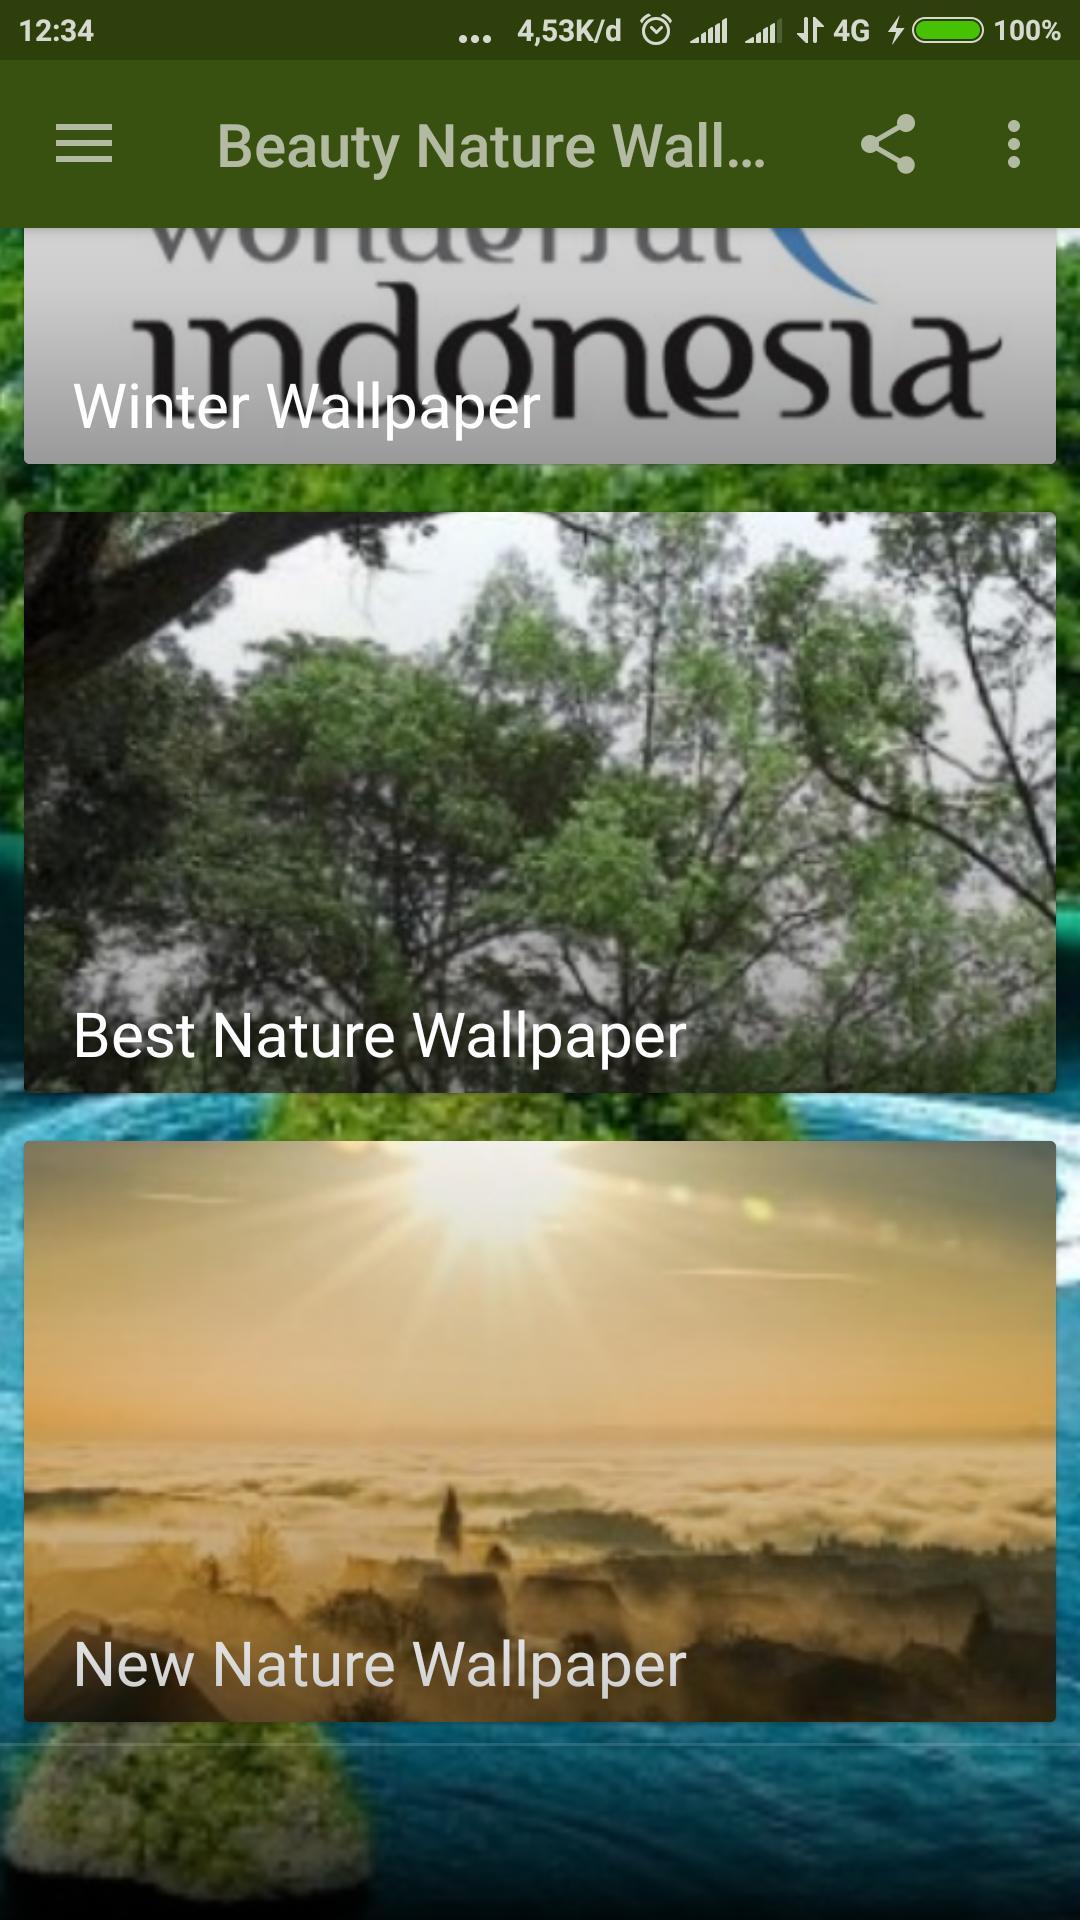 Wallpaper Keindahan Alam For Android APK Download